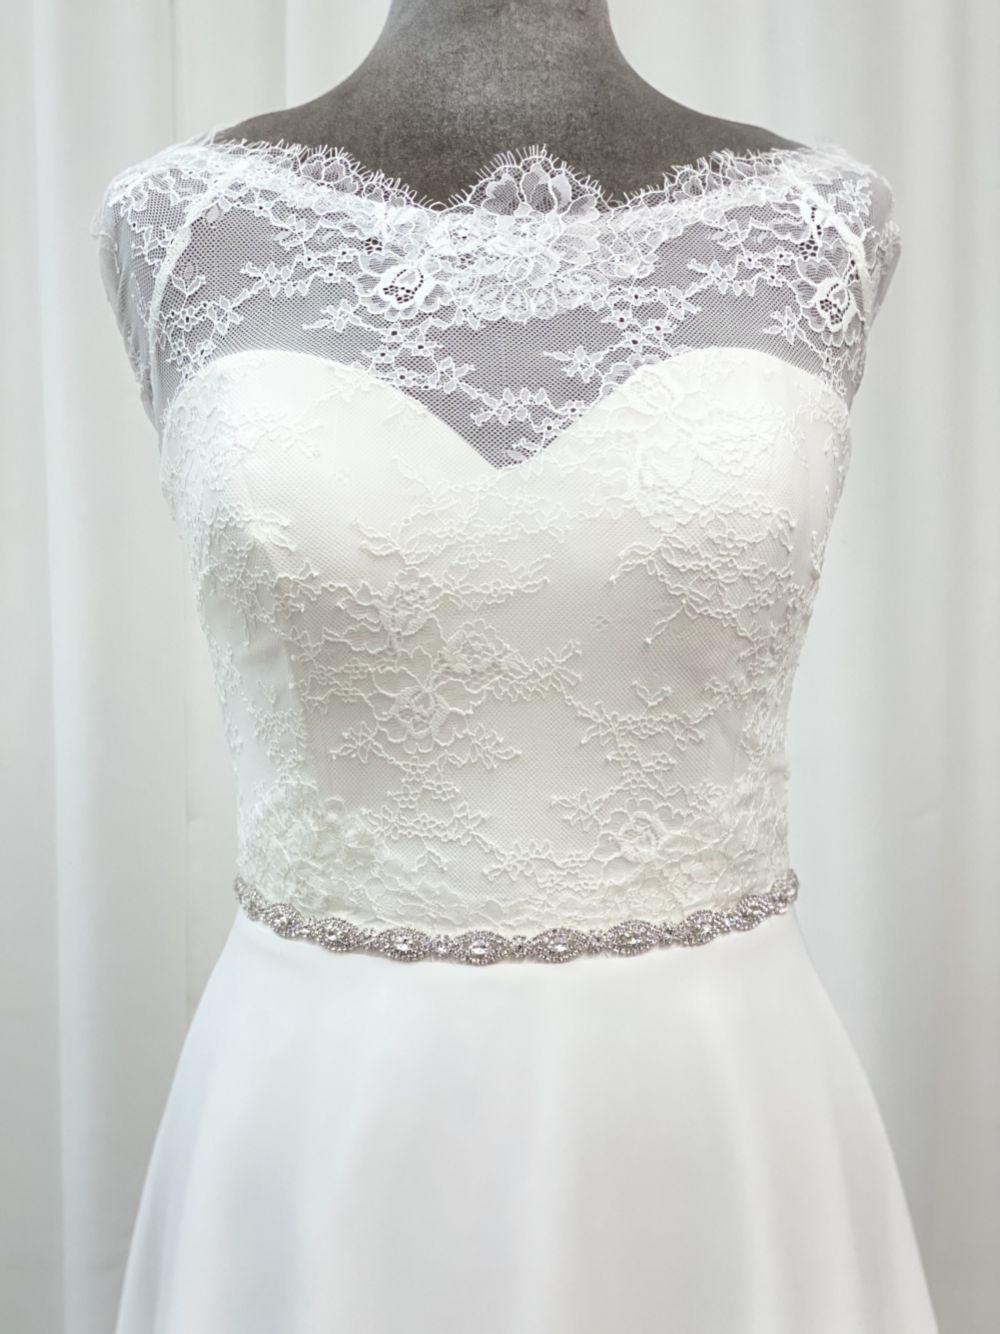 Hadley Narrow Oval Diamante Bridal Belt